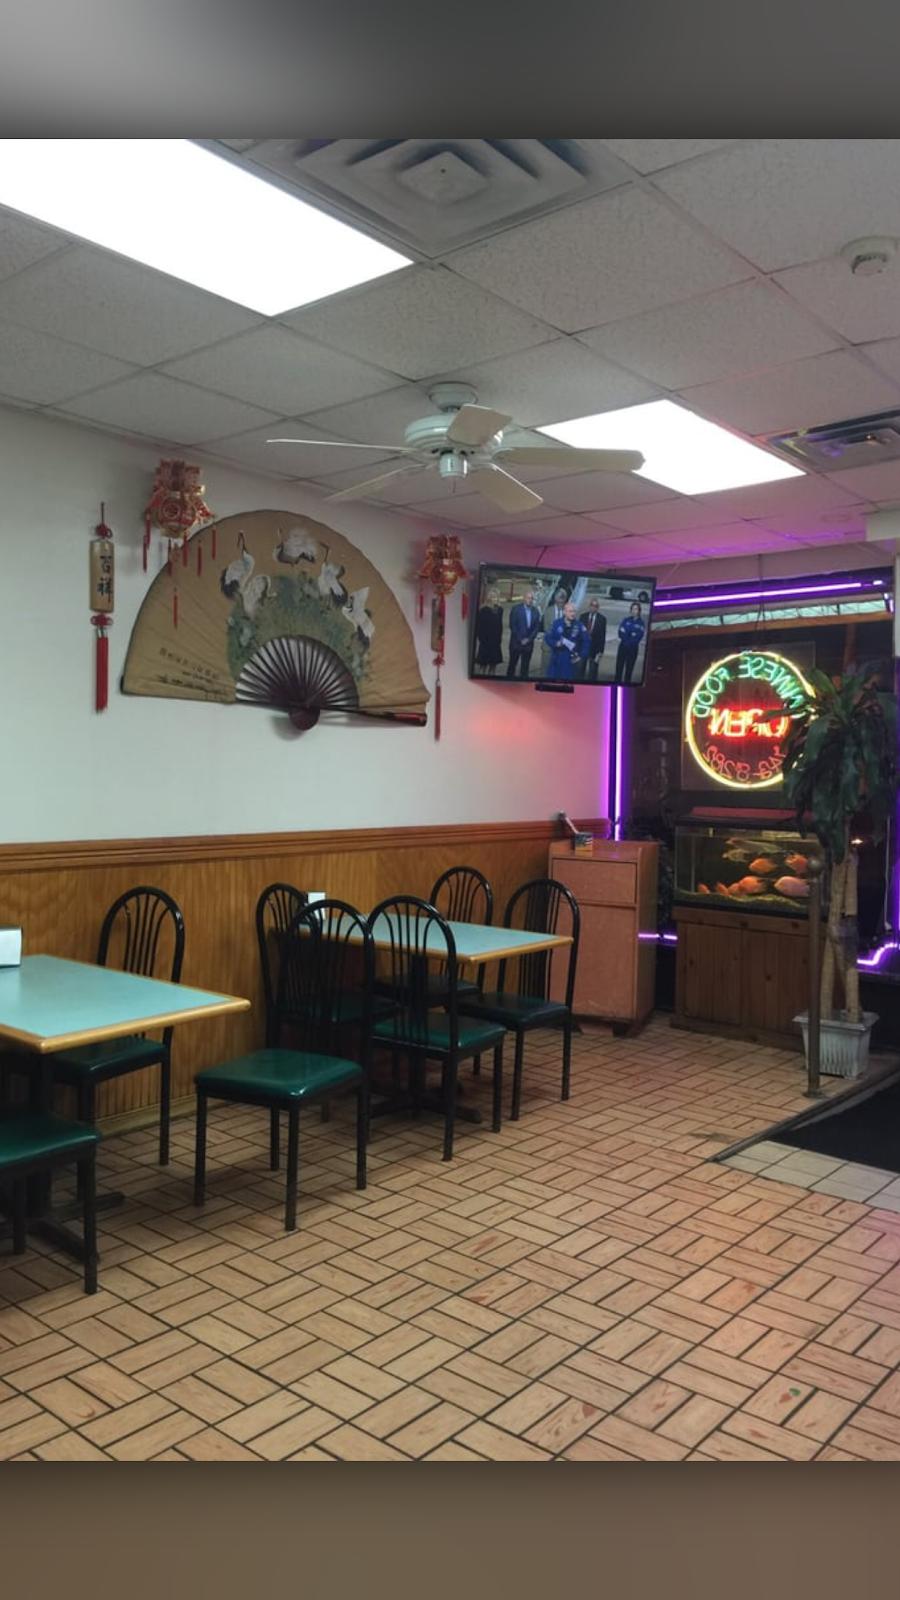 Chopsticks House | restaurant | 2 Bloomfield Ave, Bloomfield, NJ 07003, USA | 9737438282 OR +1 973-743-8282